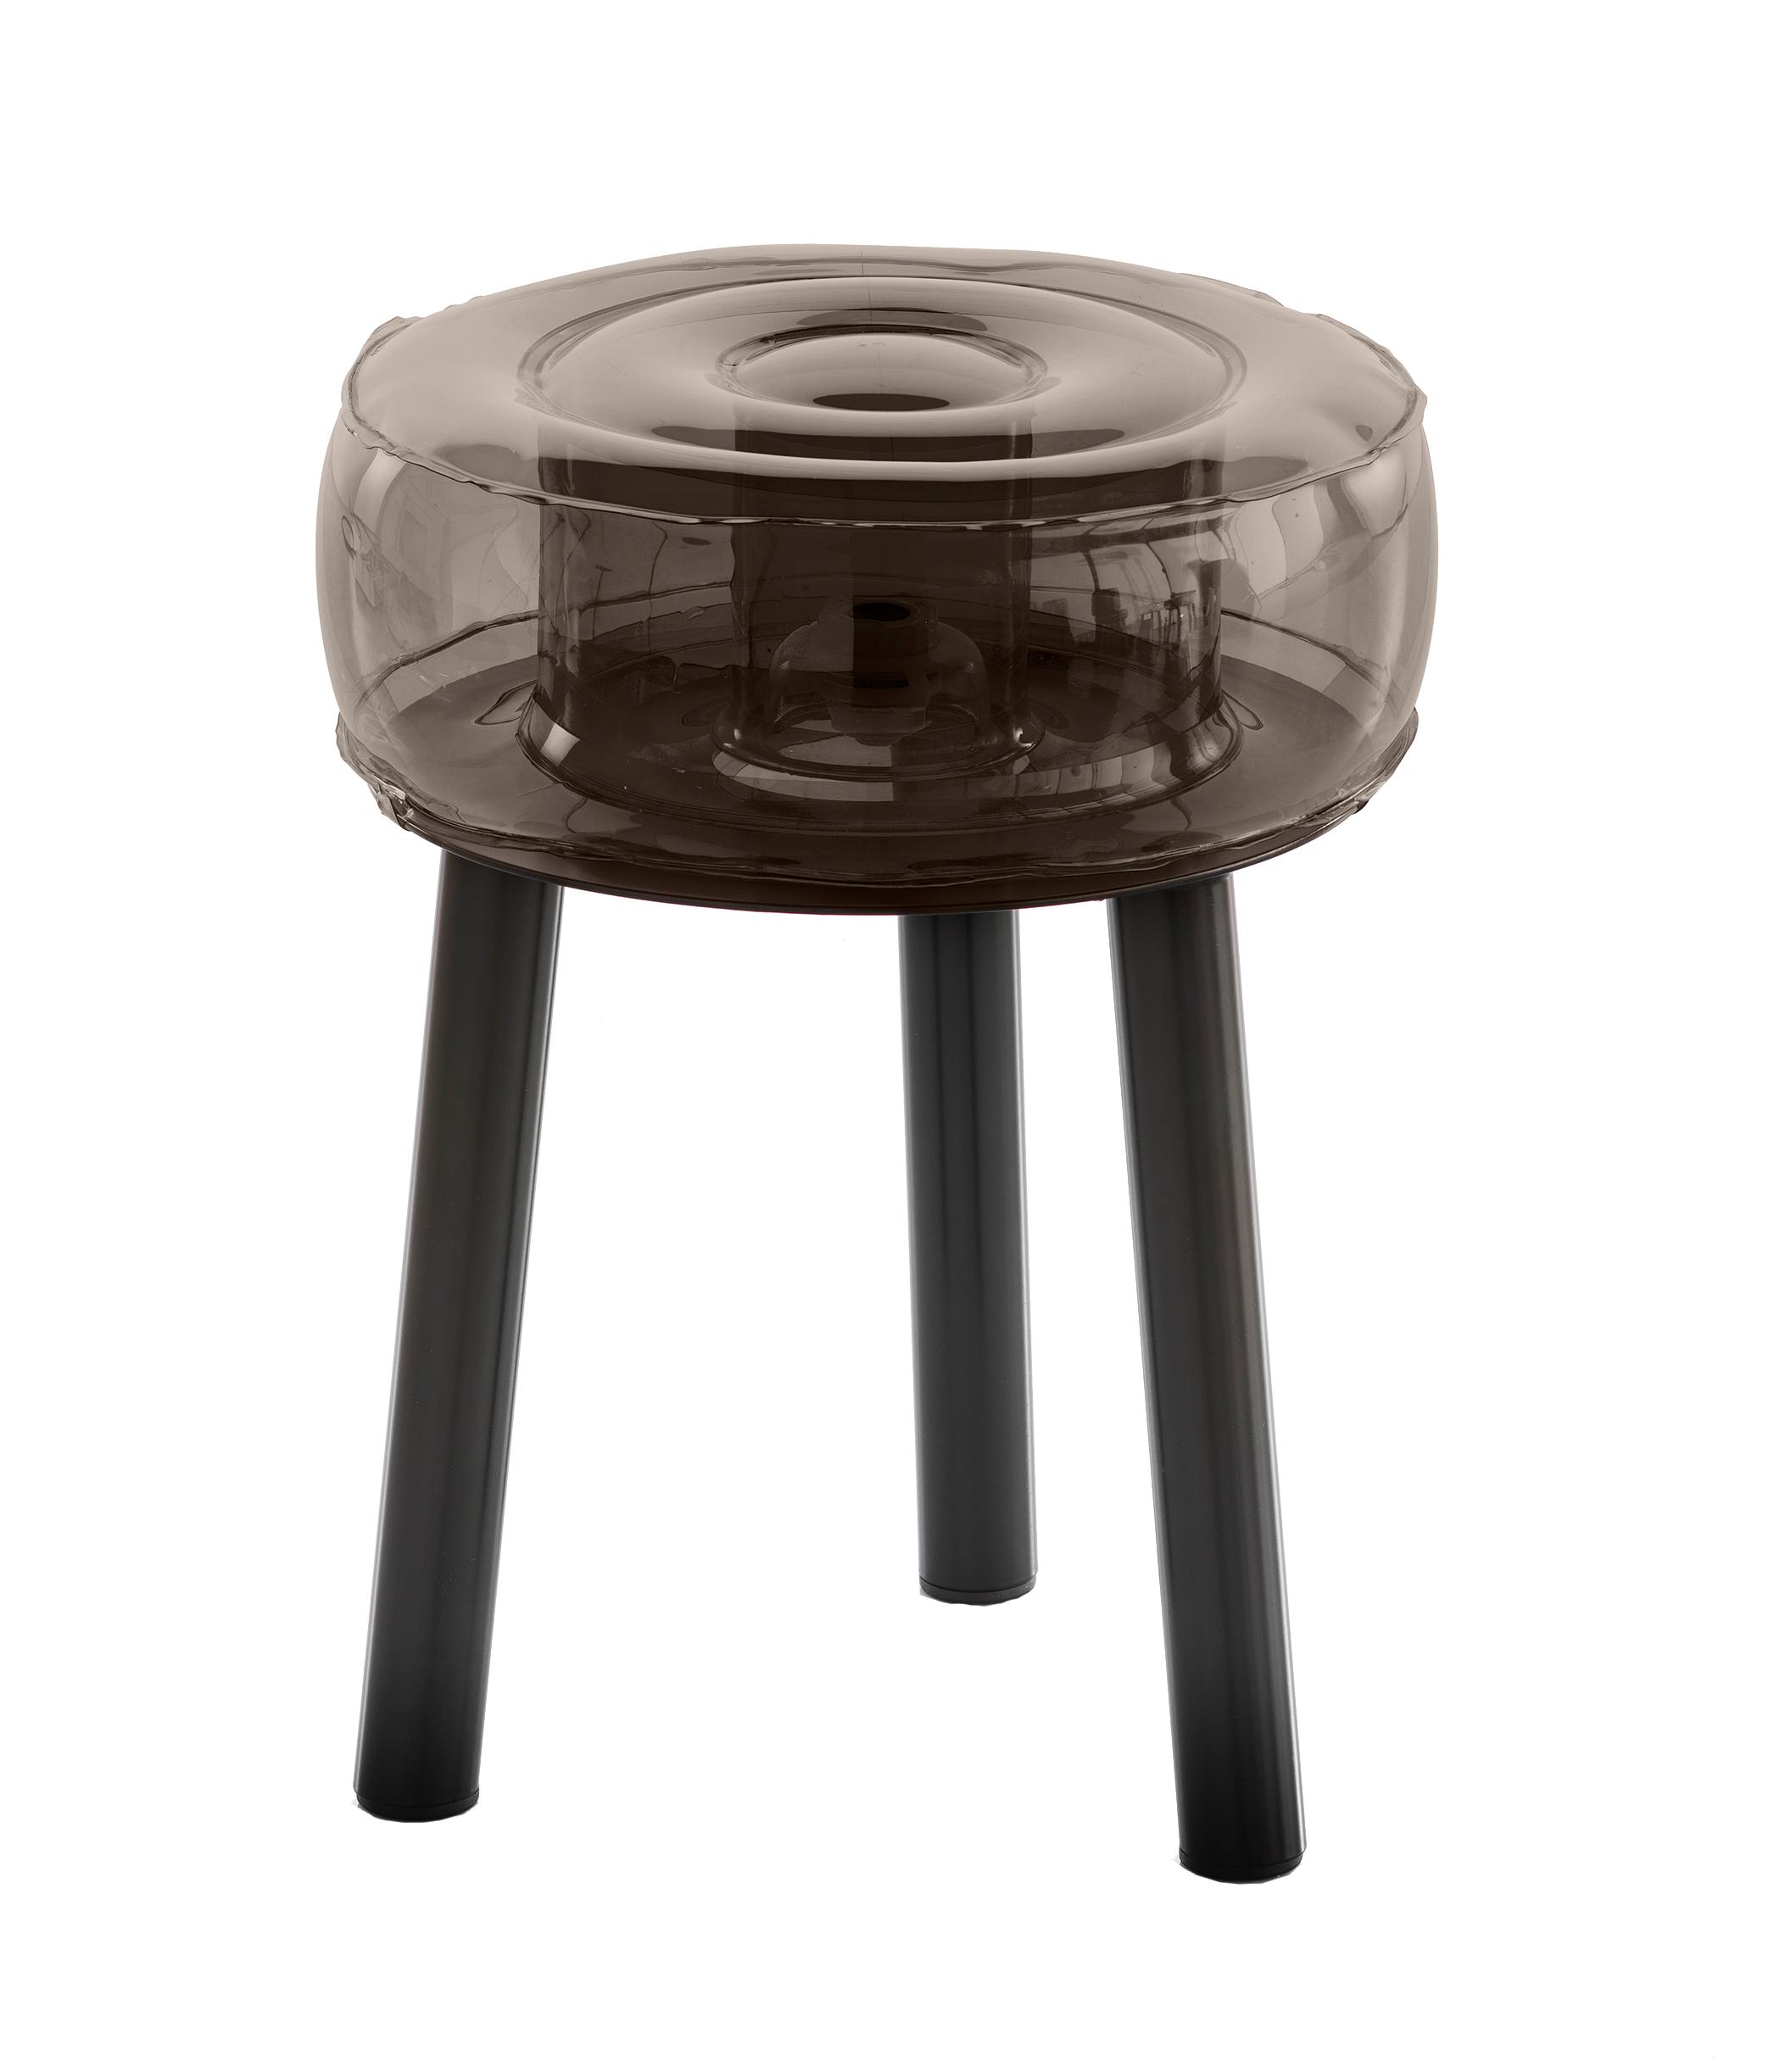 Tabouret pieds aluminium assise tpu noir